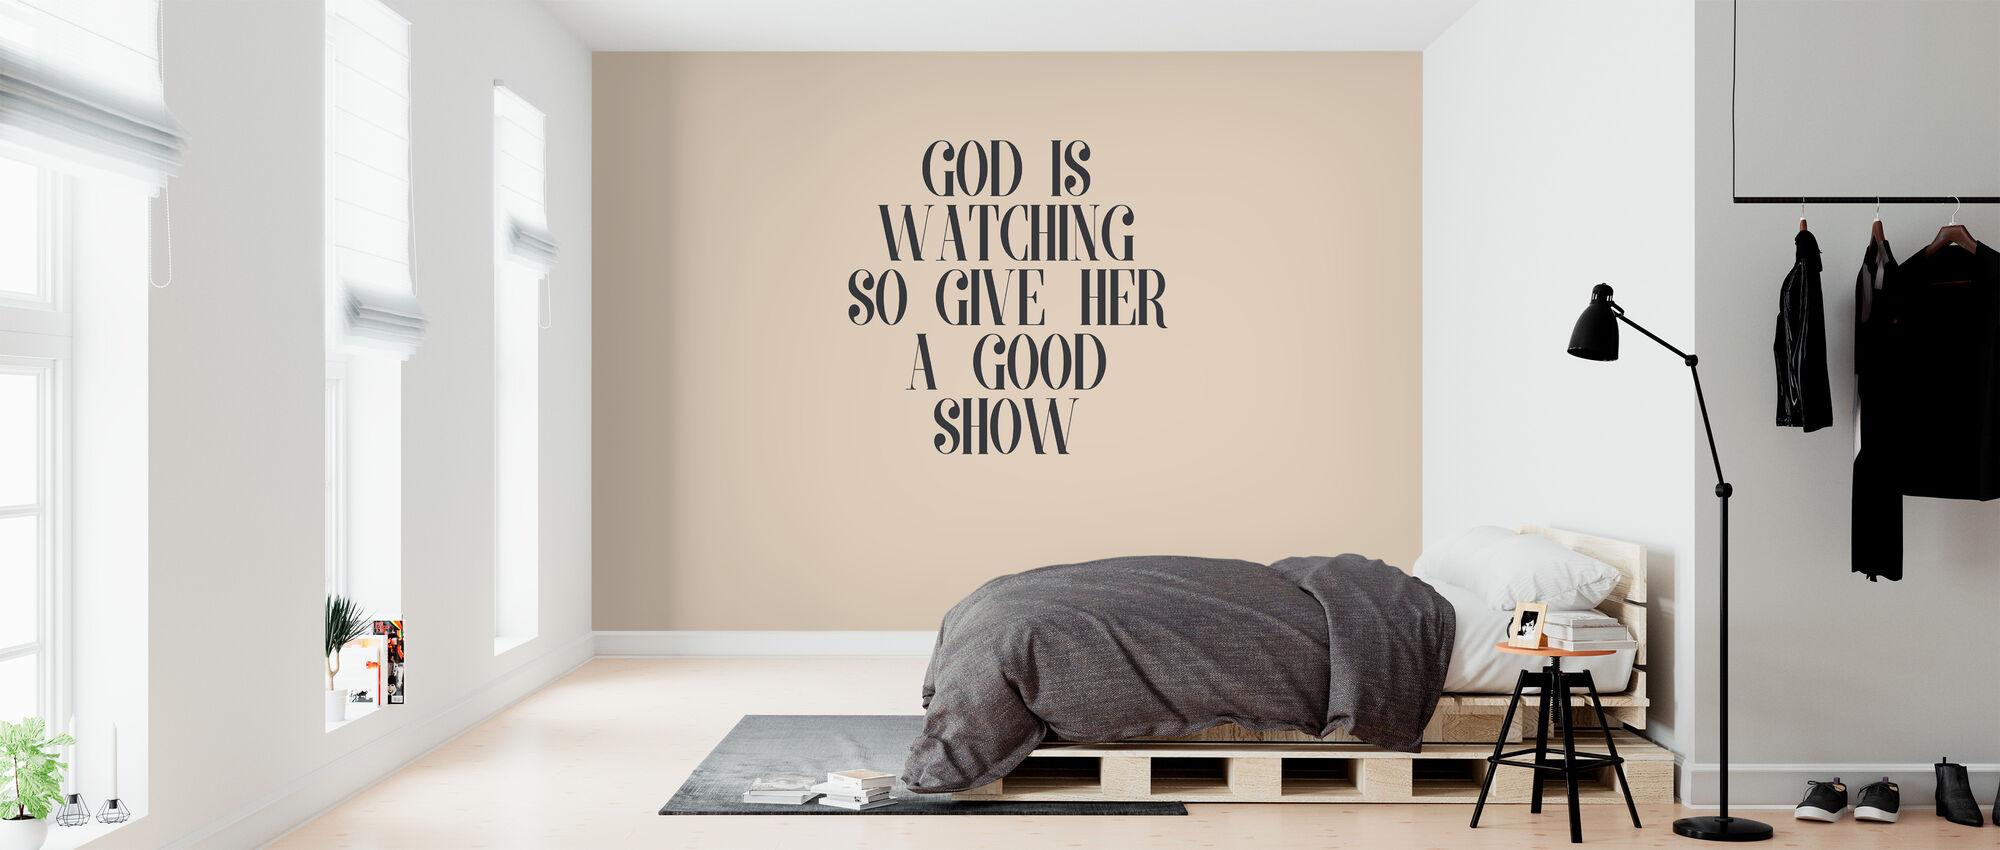 Jumala katselee - Tapetti - Makuuhuone